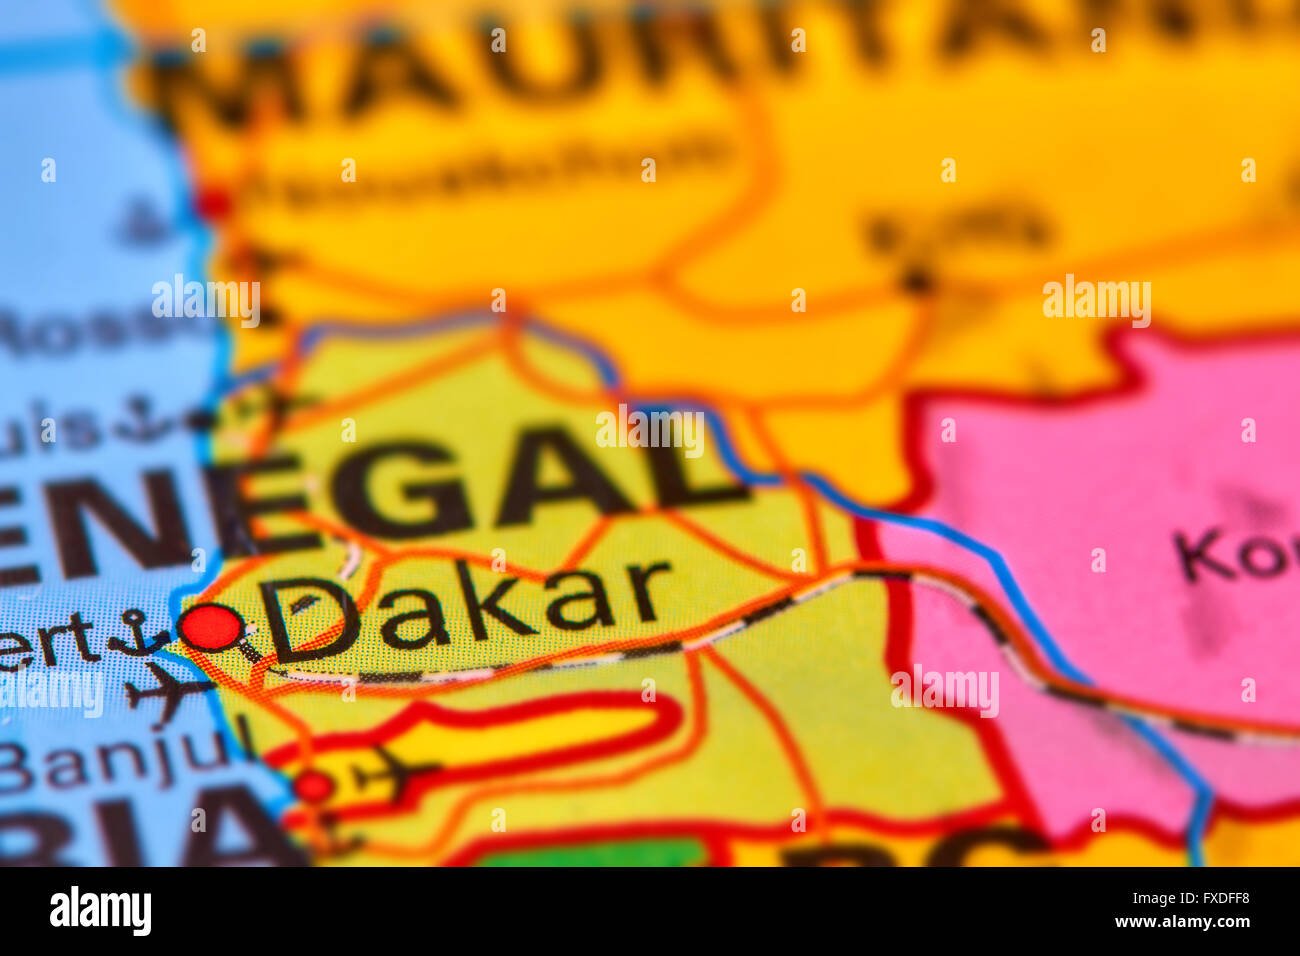 Dakar, capital de Senegal en África en el mapa del mundo Imagen De Stock